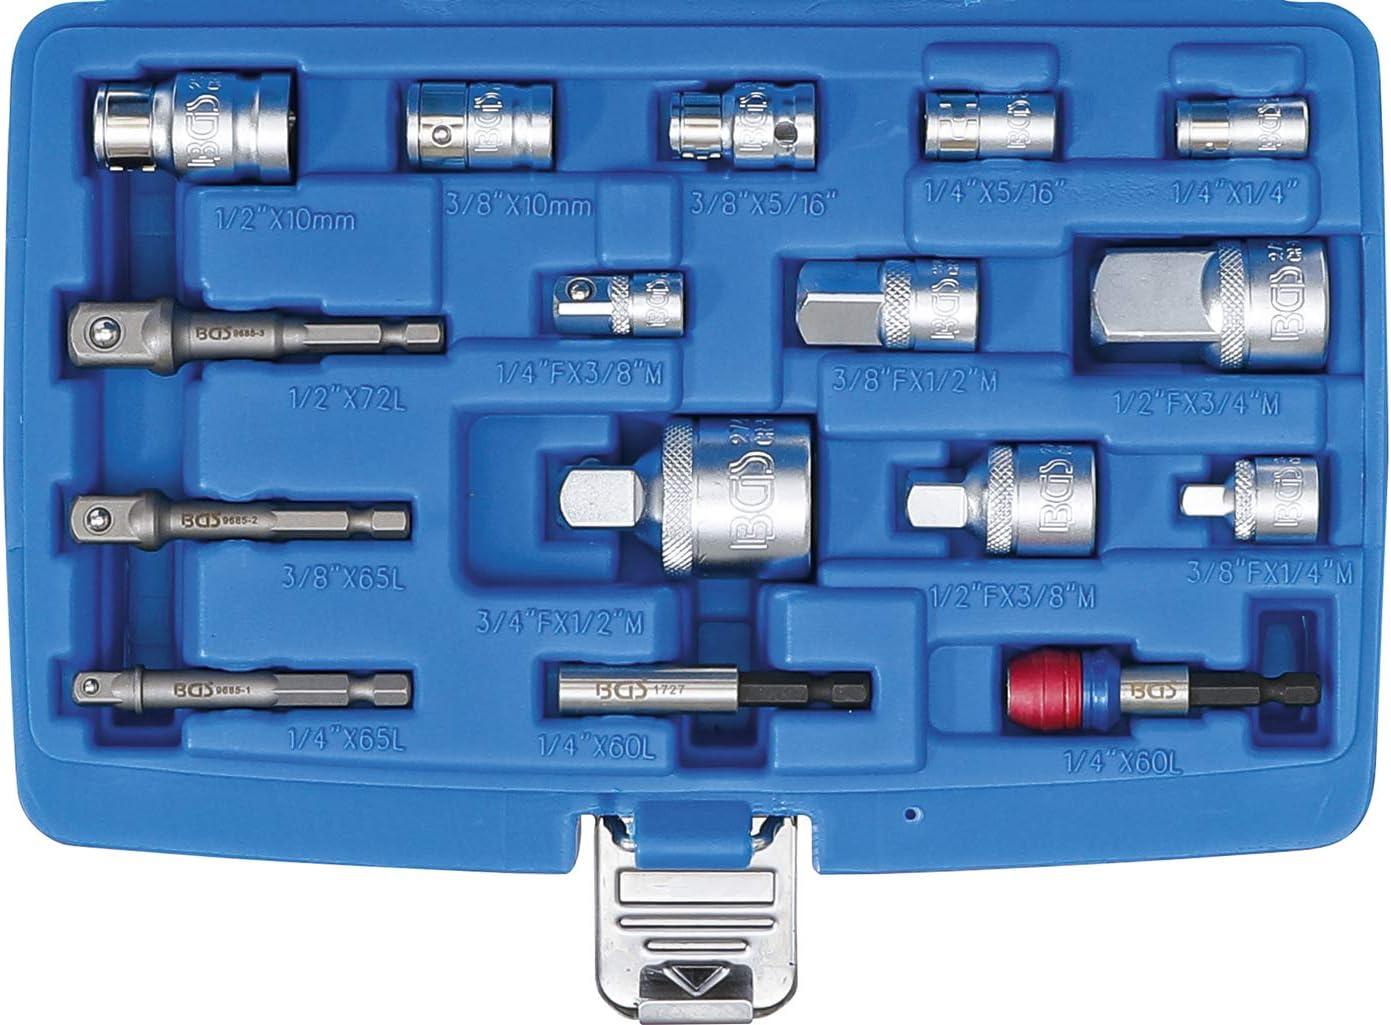 BGS Technic 1119-1 Adaptador